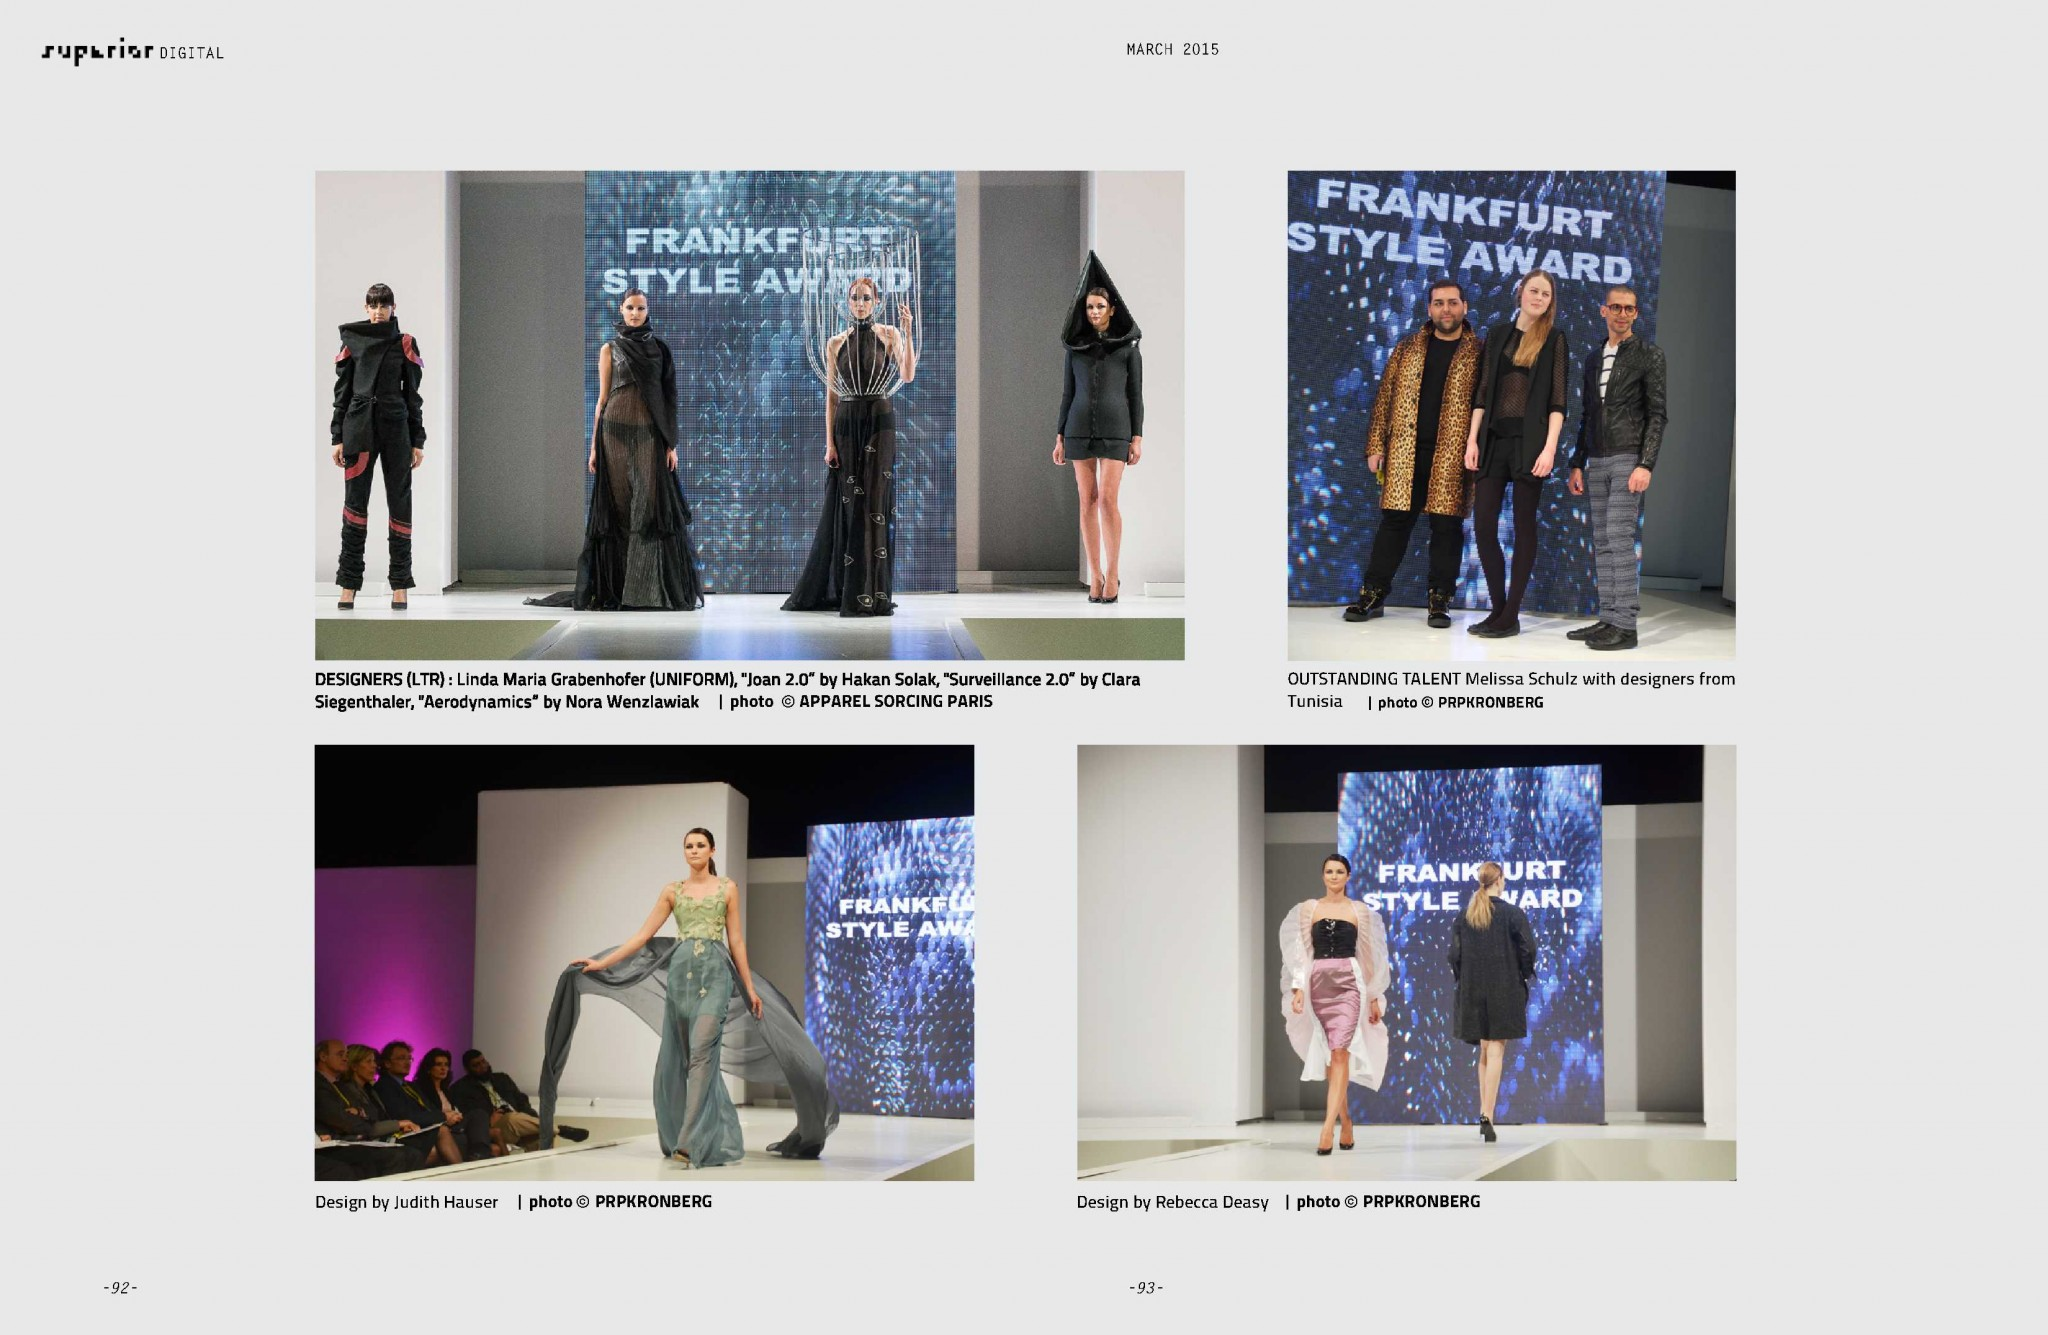 SUPERIOR DIGITAL March 2015 - Frankfurt Style Award_2